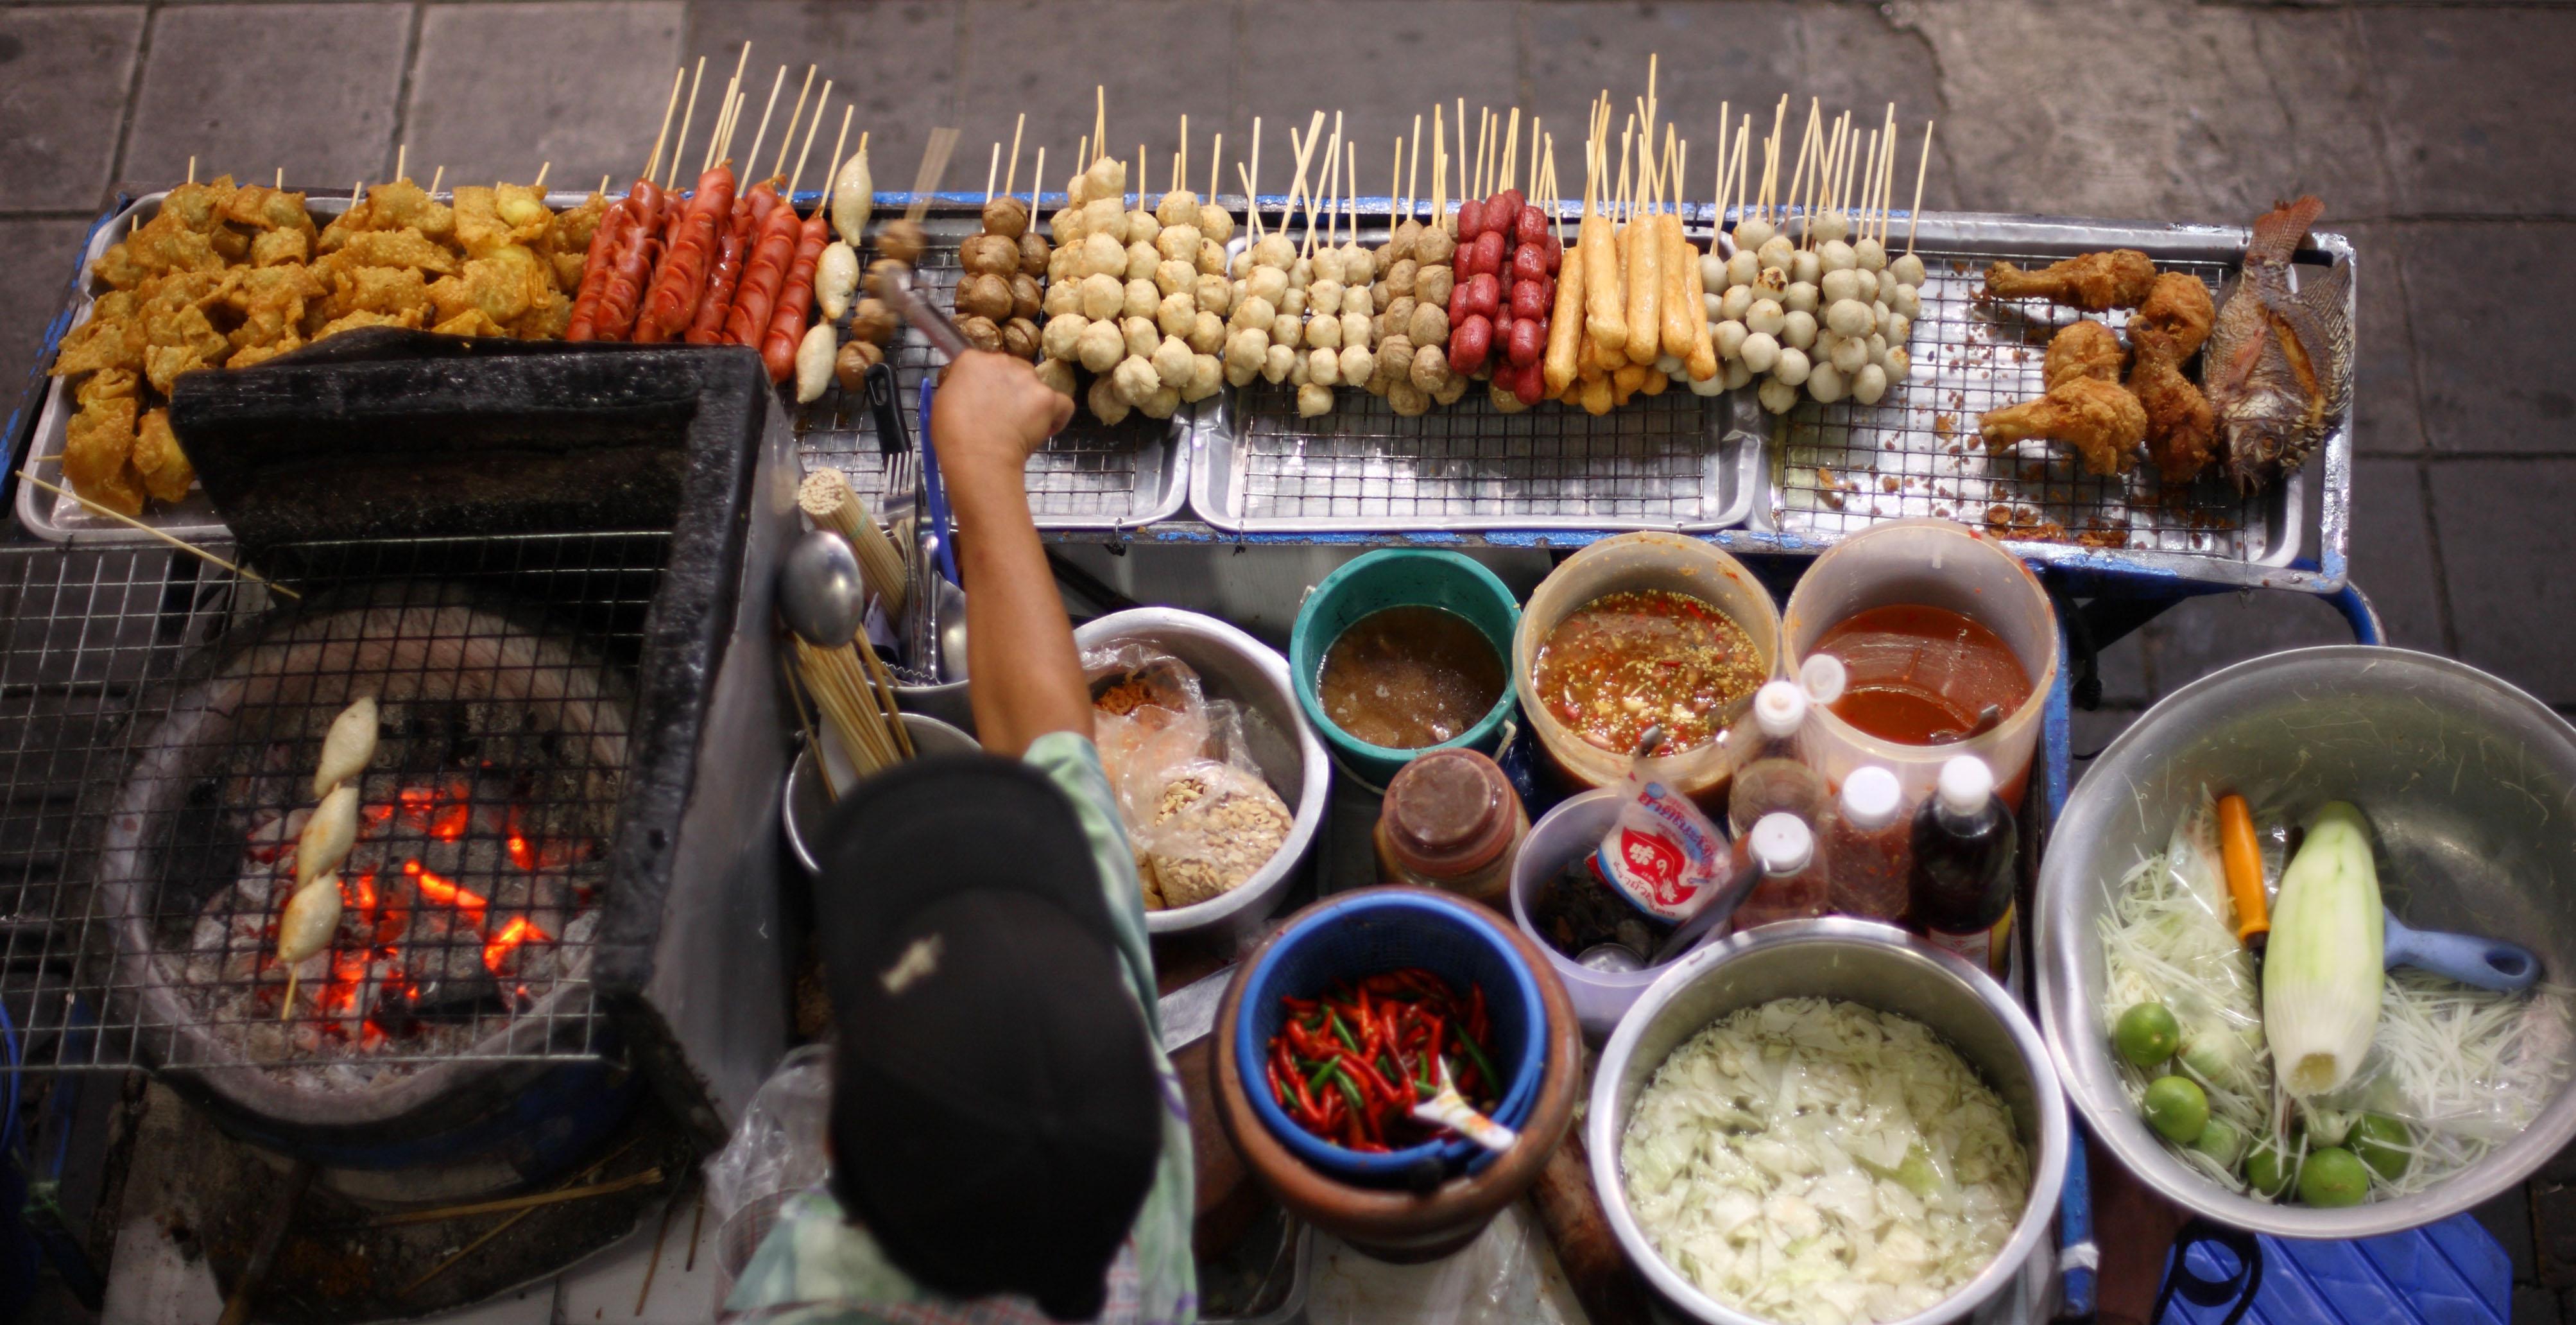 kebab vendor